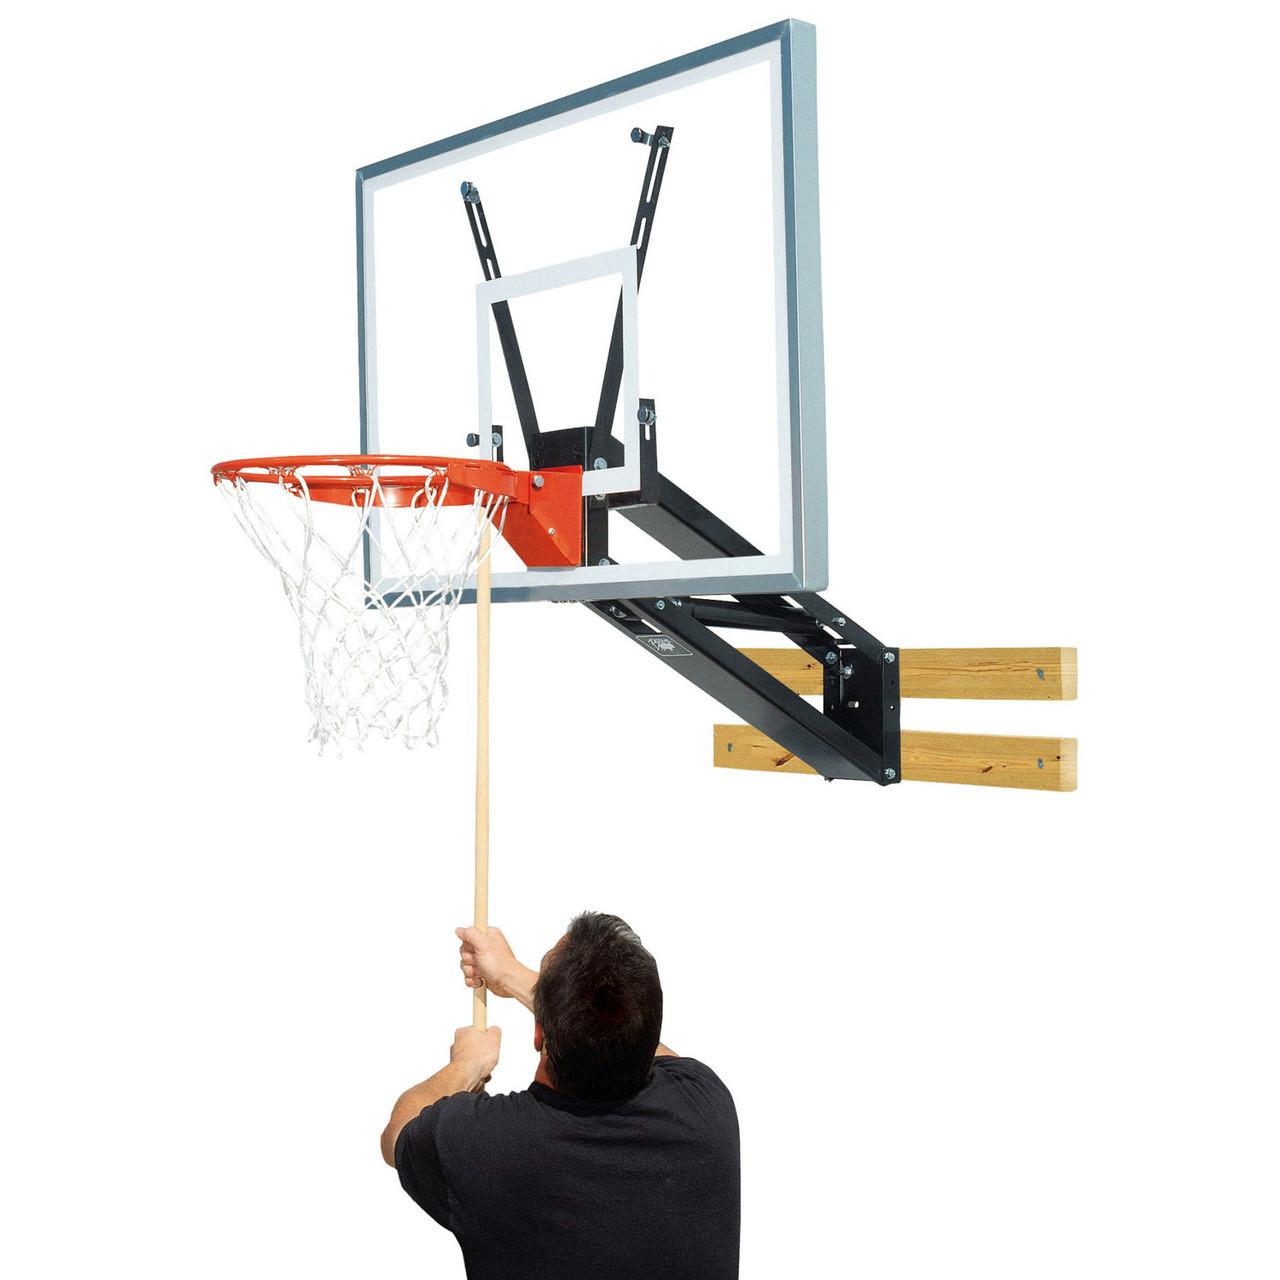 Bison PKG275 Qwik-Change Acrylic Wall Mounted Basketball Shooting Station